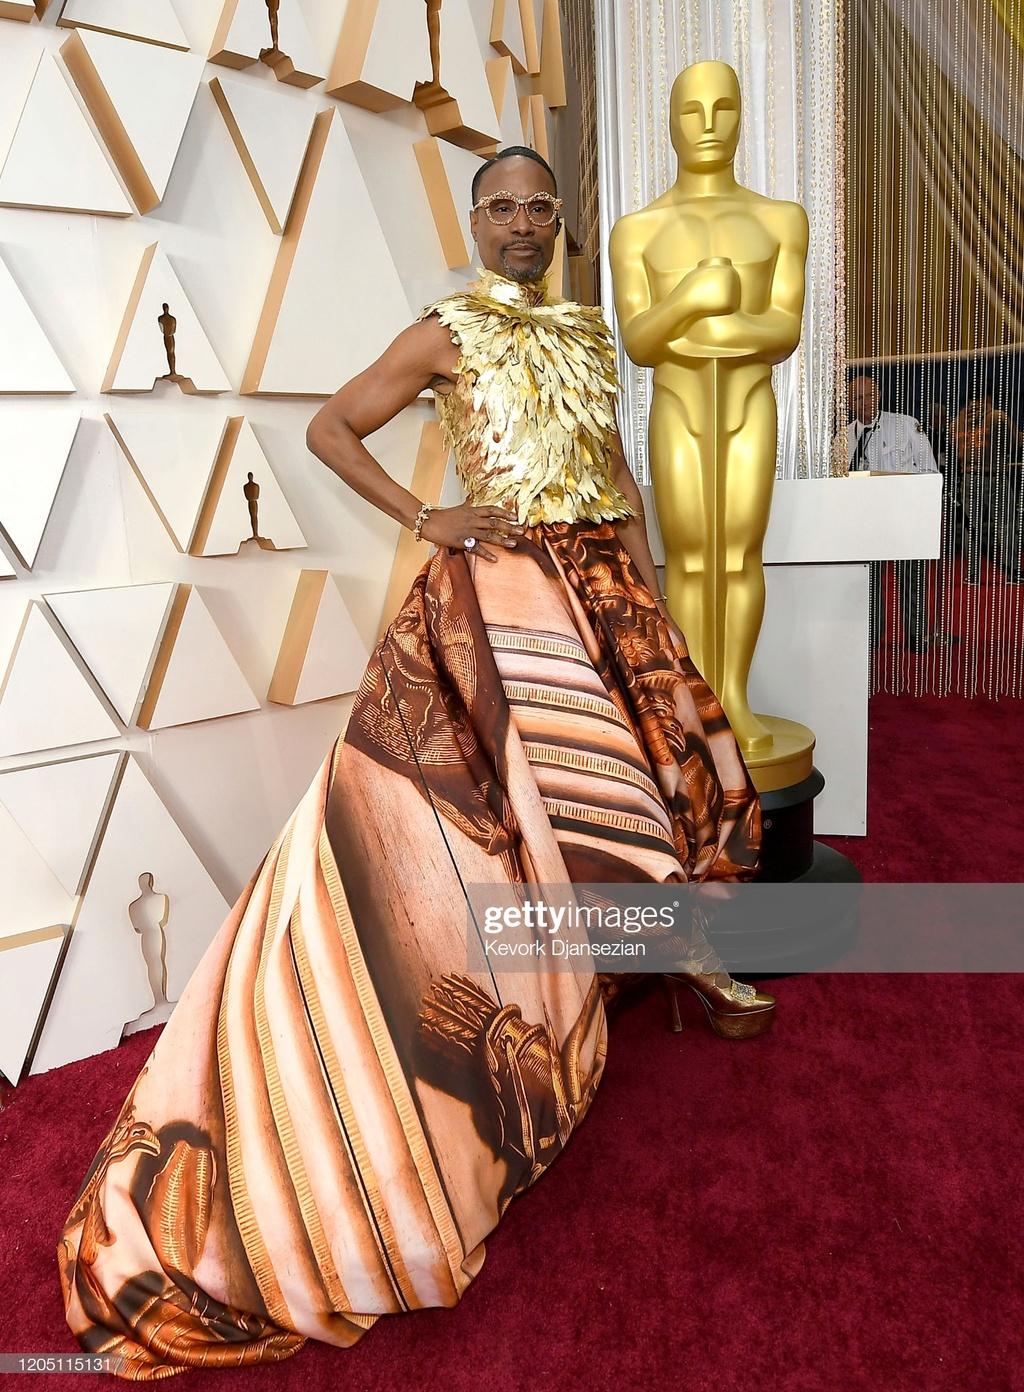 Sao nu mac dep tren tham do Oscar 2020 hinh anh 9 gettyimages_1205115131_2048x2048.jpg